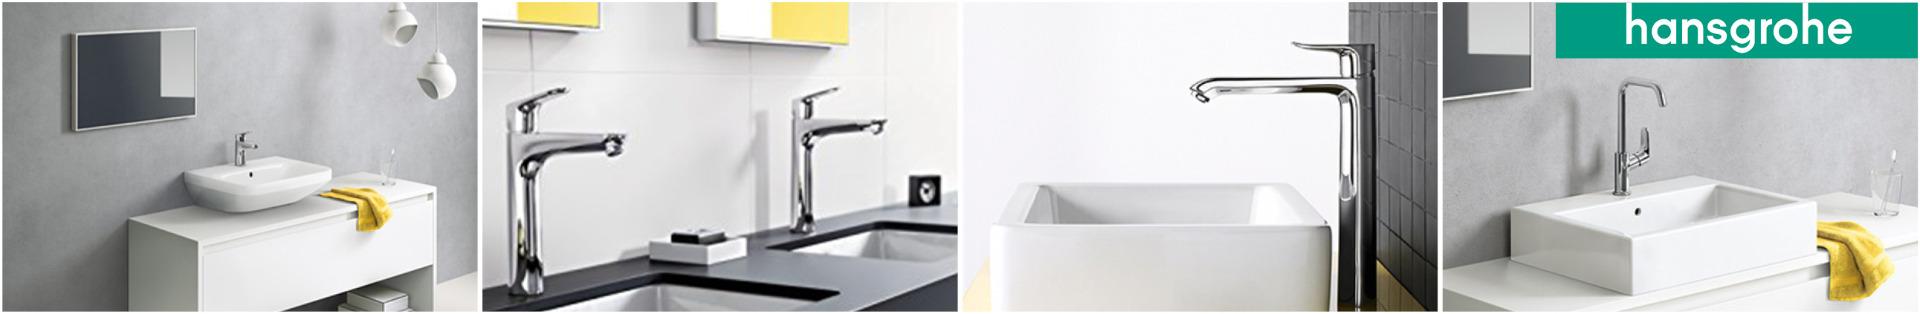 hansgrohe bathroom mixer taps